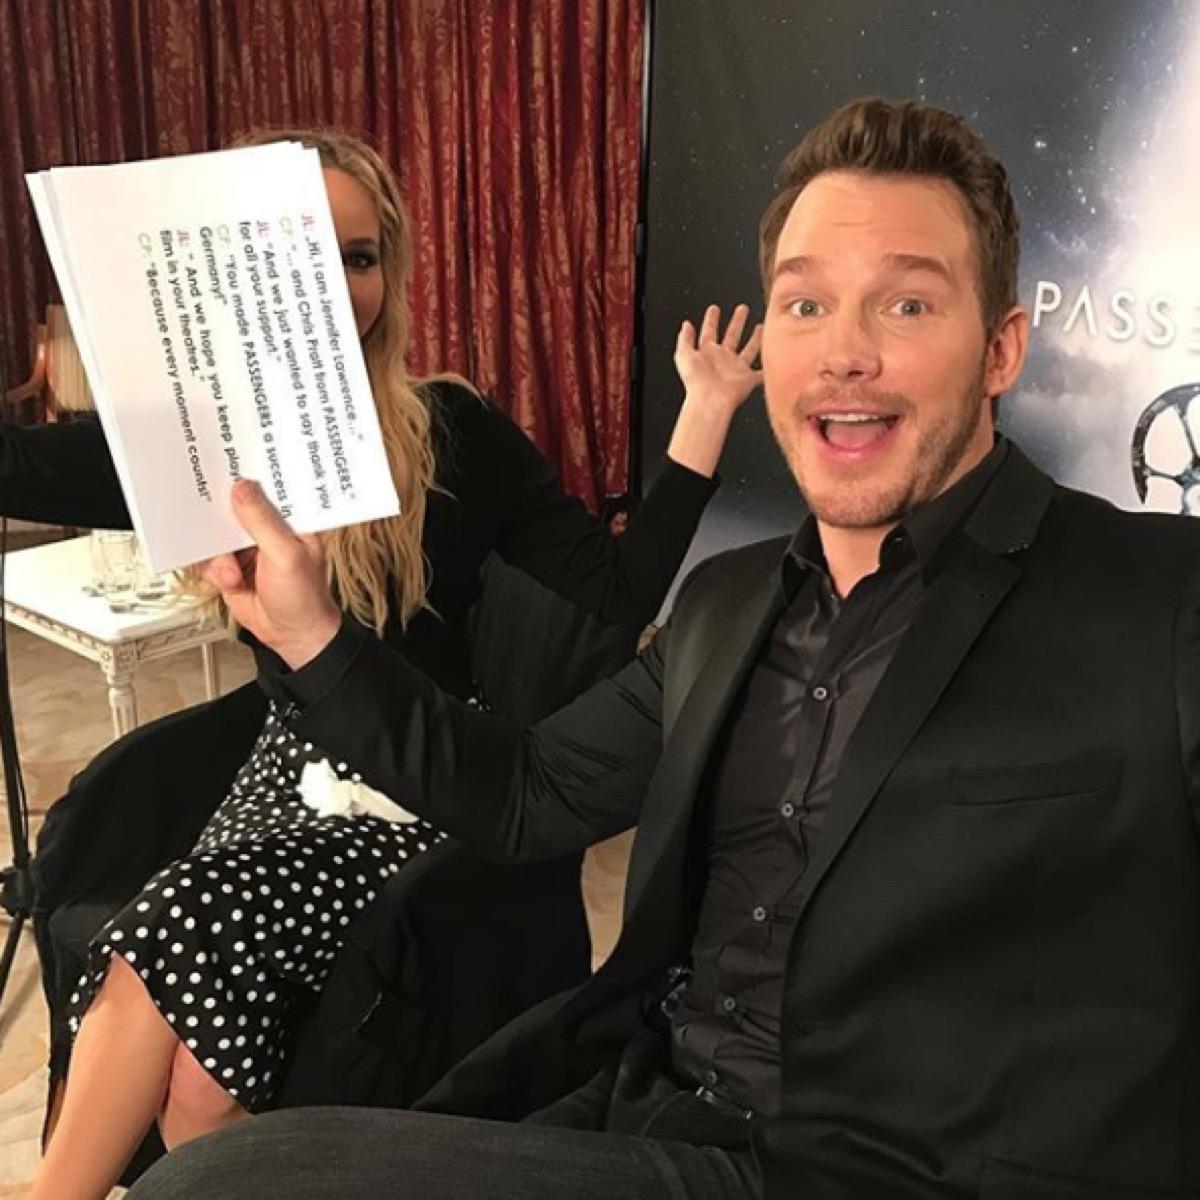 chris pratt prank on jennifer lawrence for media tour, celebrity pranksters